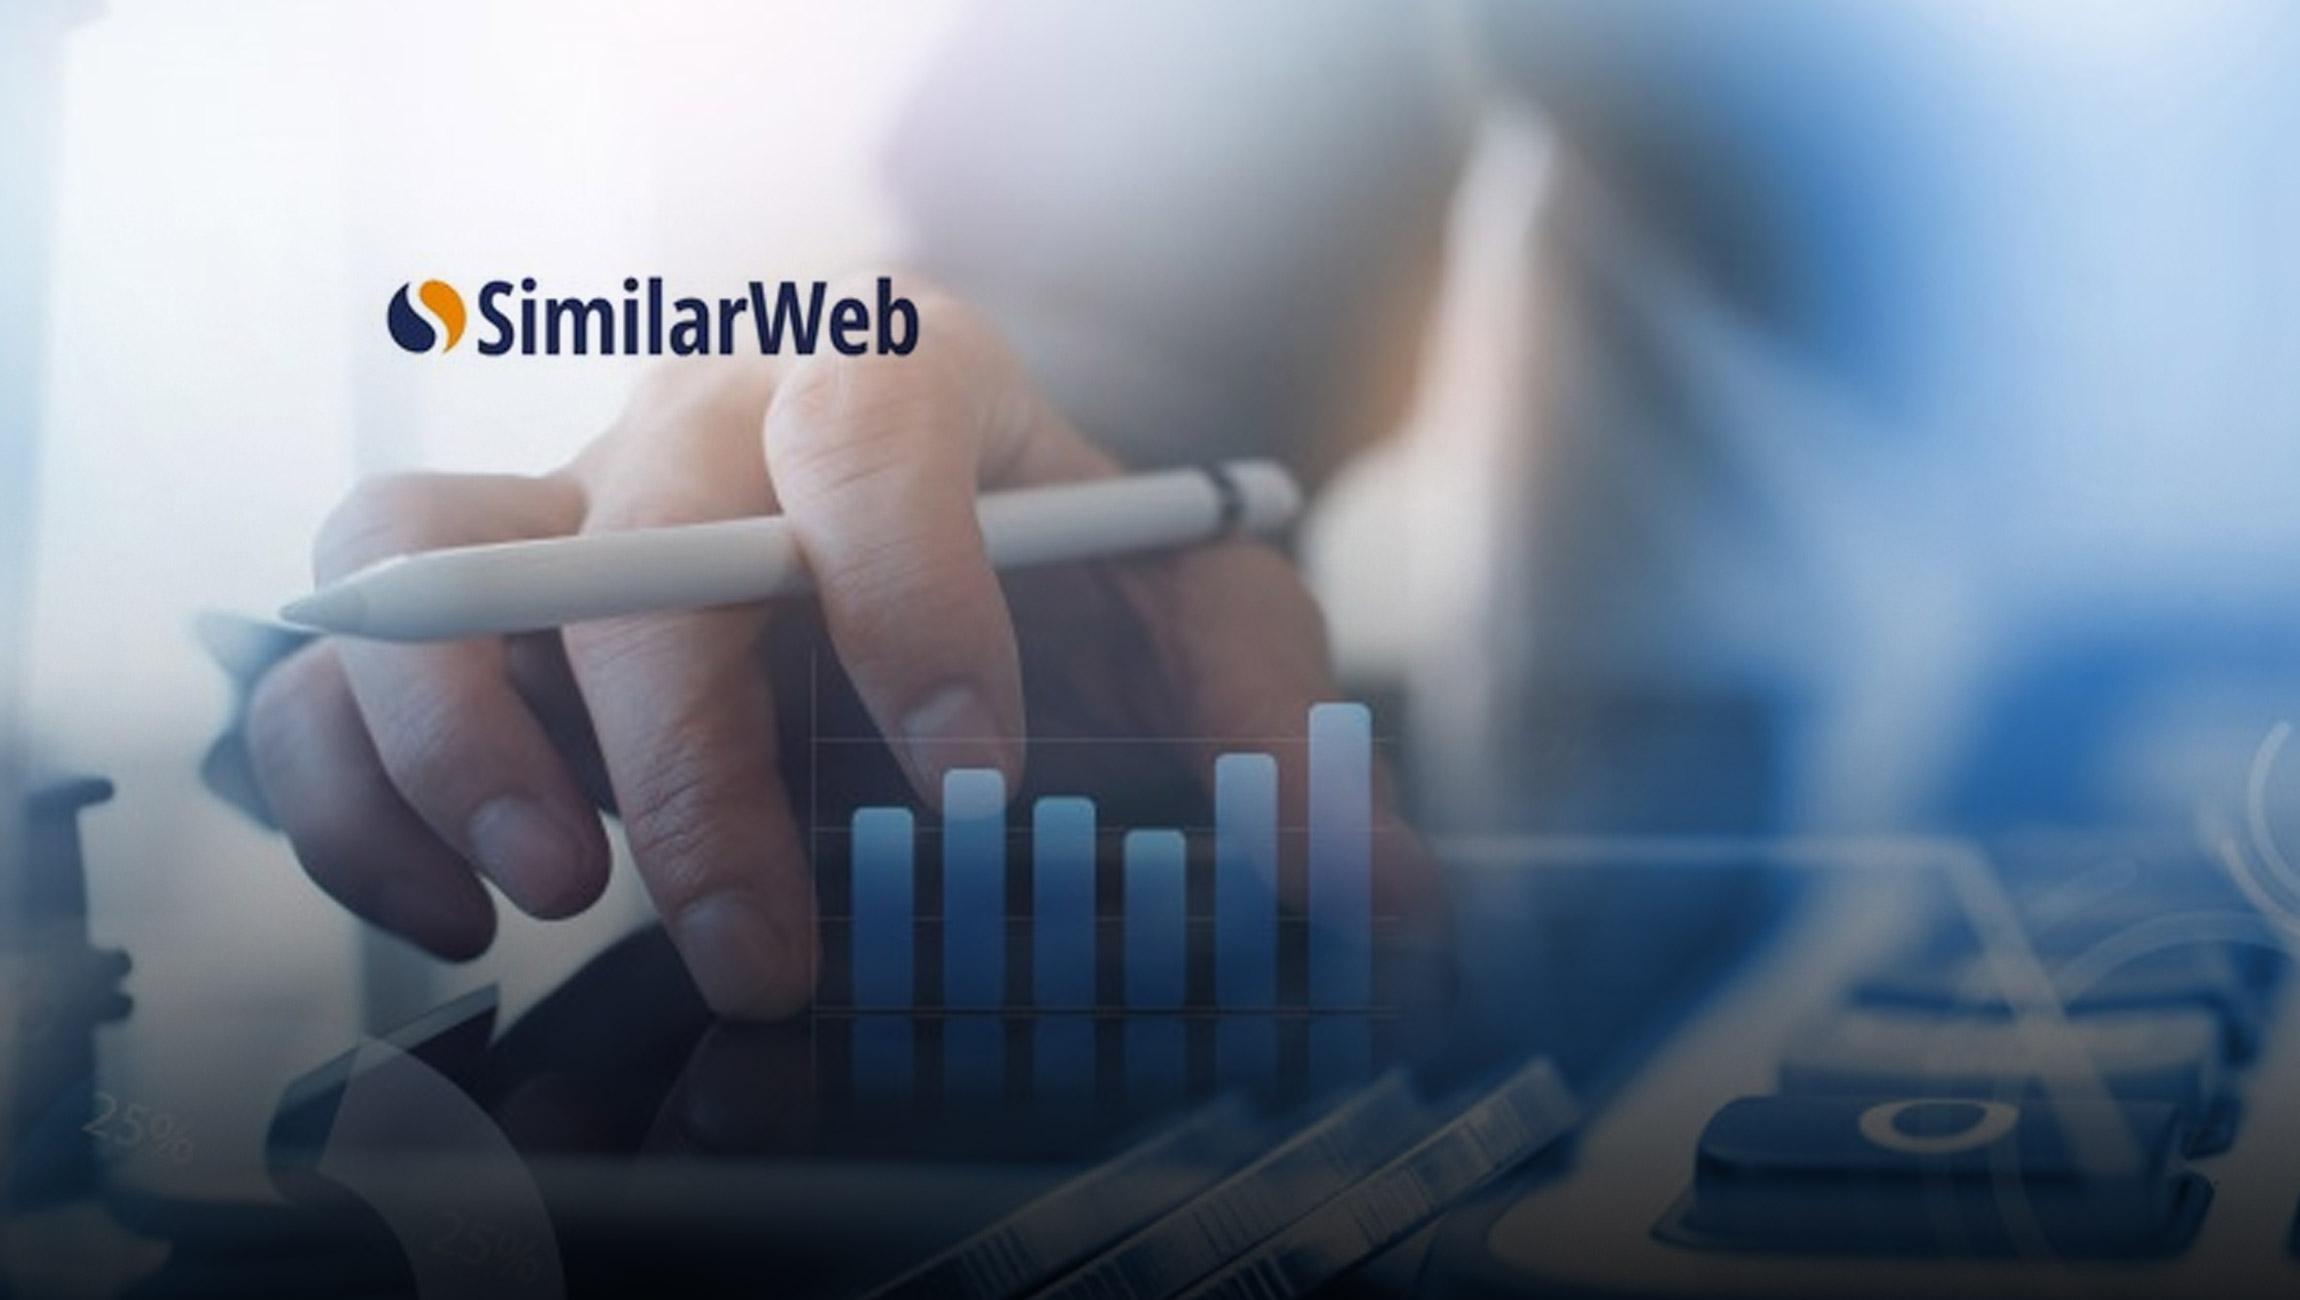 SimilarWeb announces closing of $120M financing round